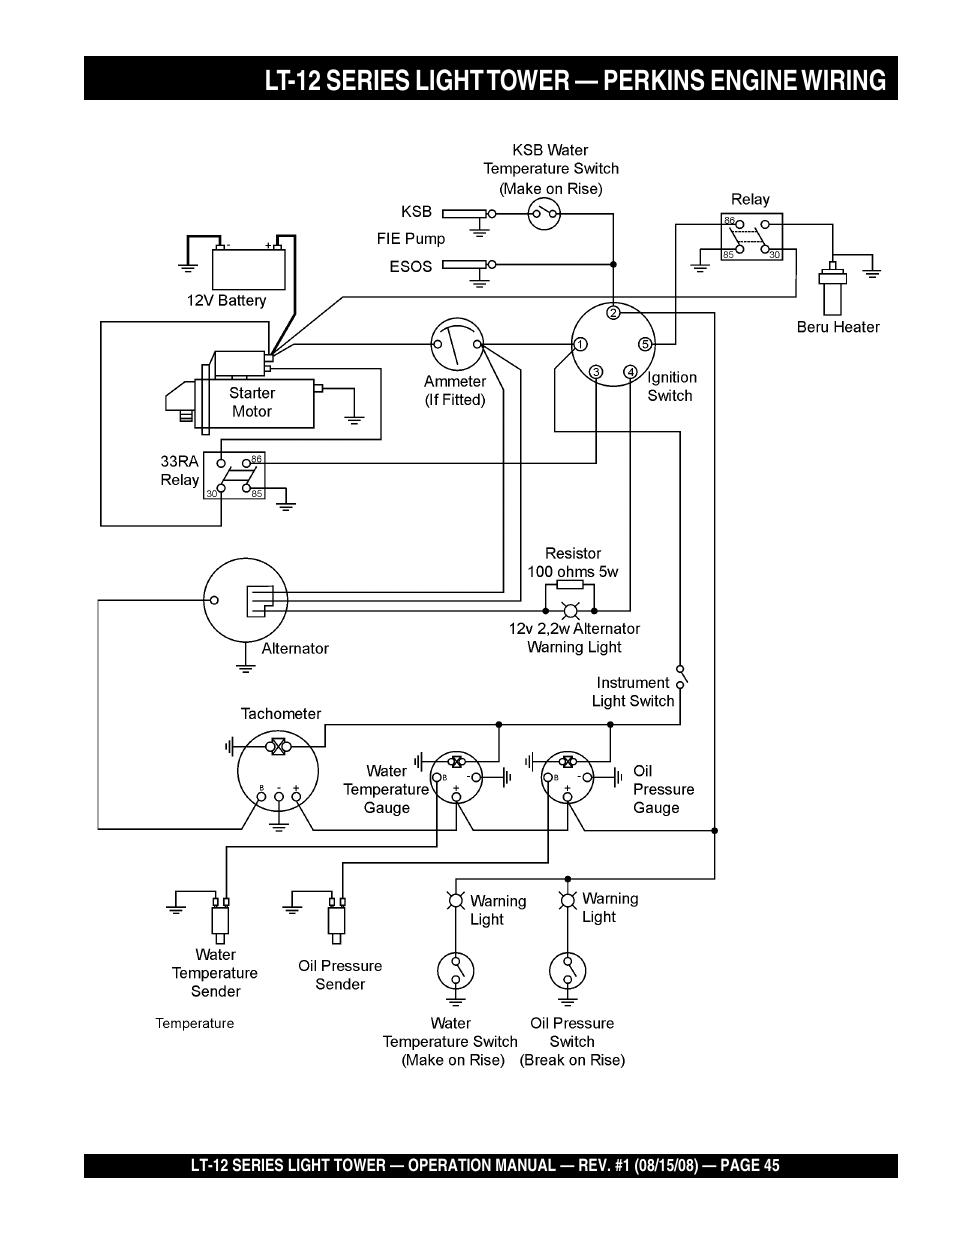 medium resolution of lt 12 series light tower perkins engine wiring stow nighthawk dedicated light tower